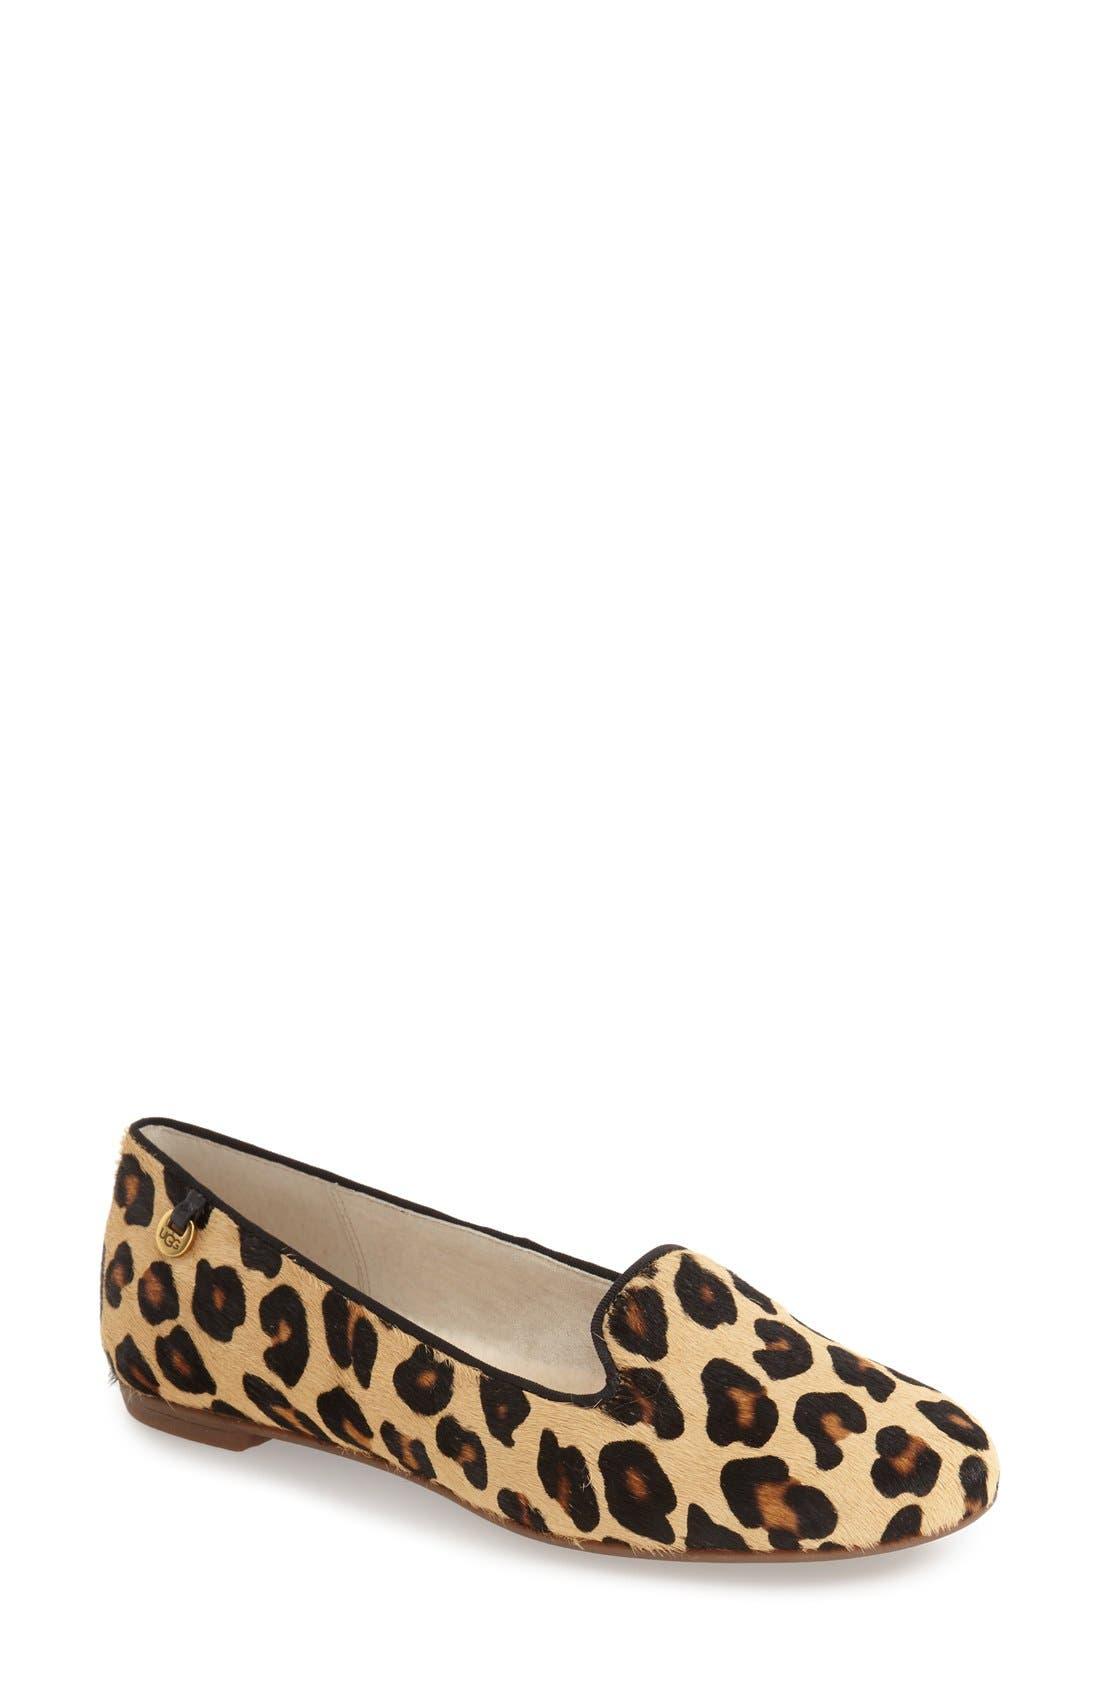 'Blyss' Leopard Spot Calf Hair Flat,                         Main,                         color, 200